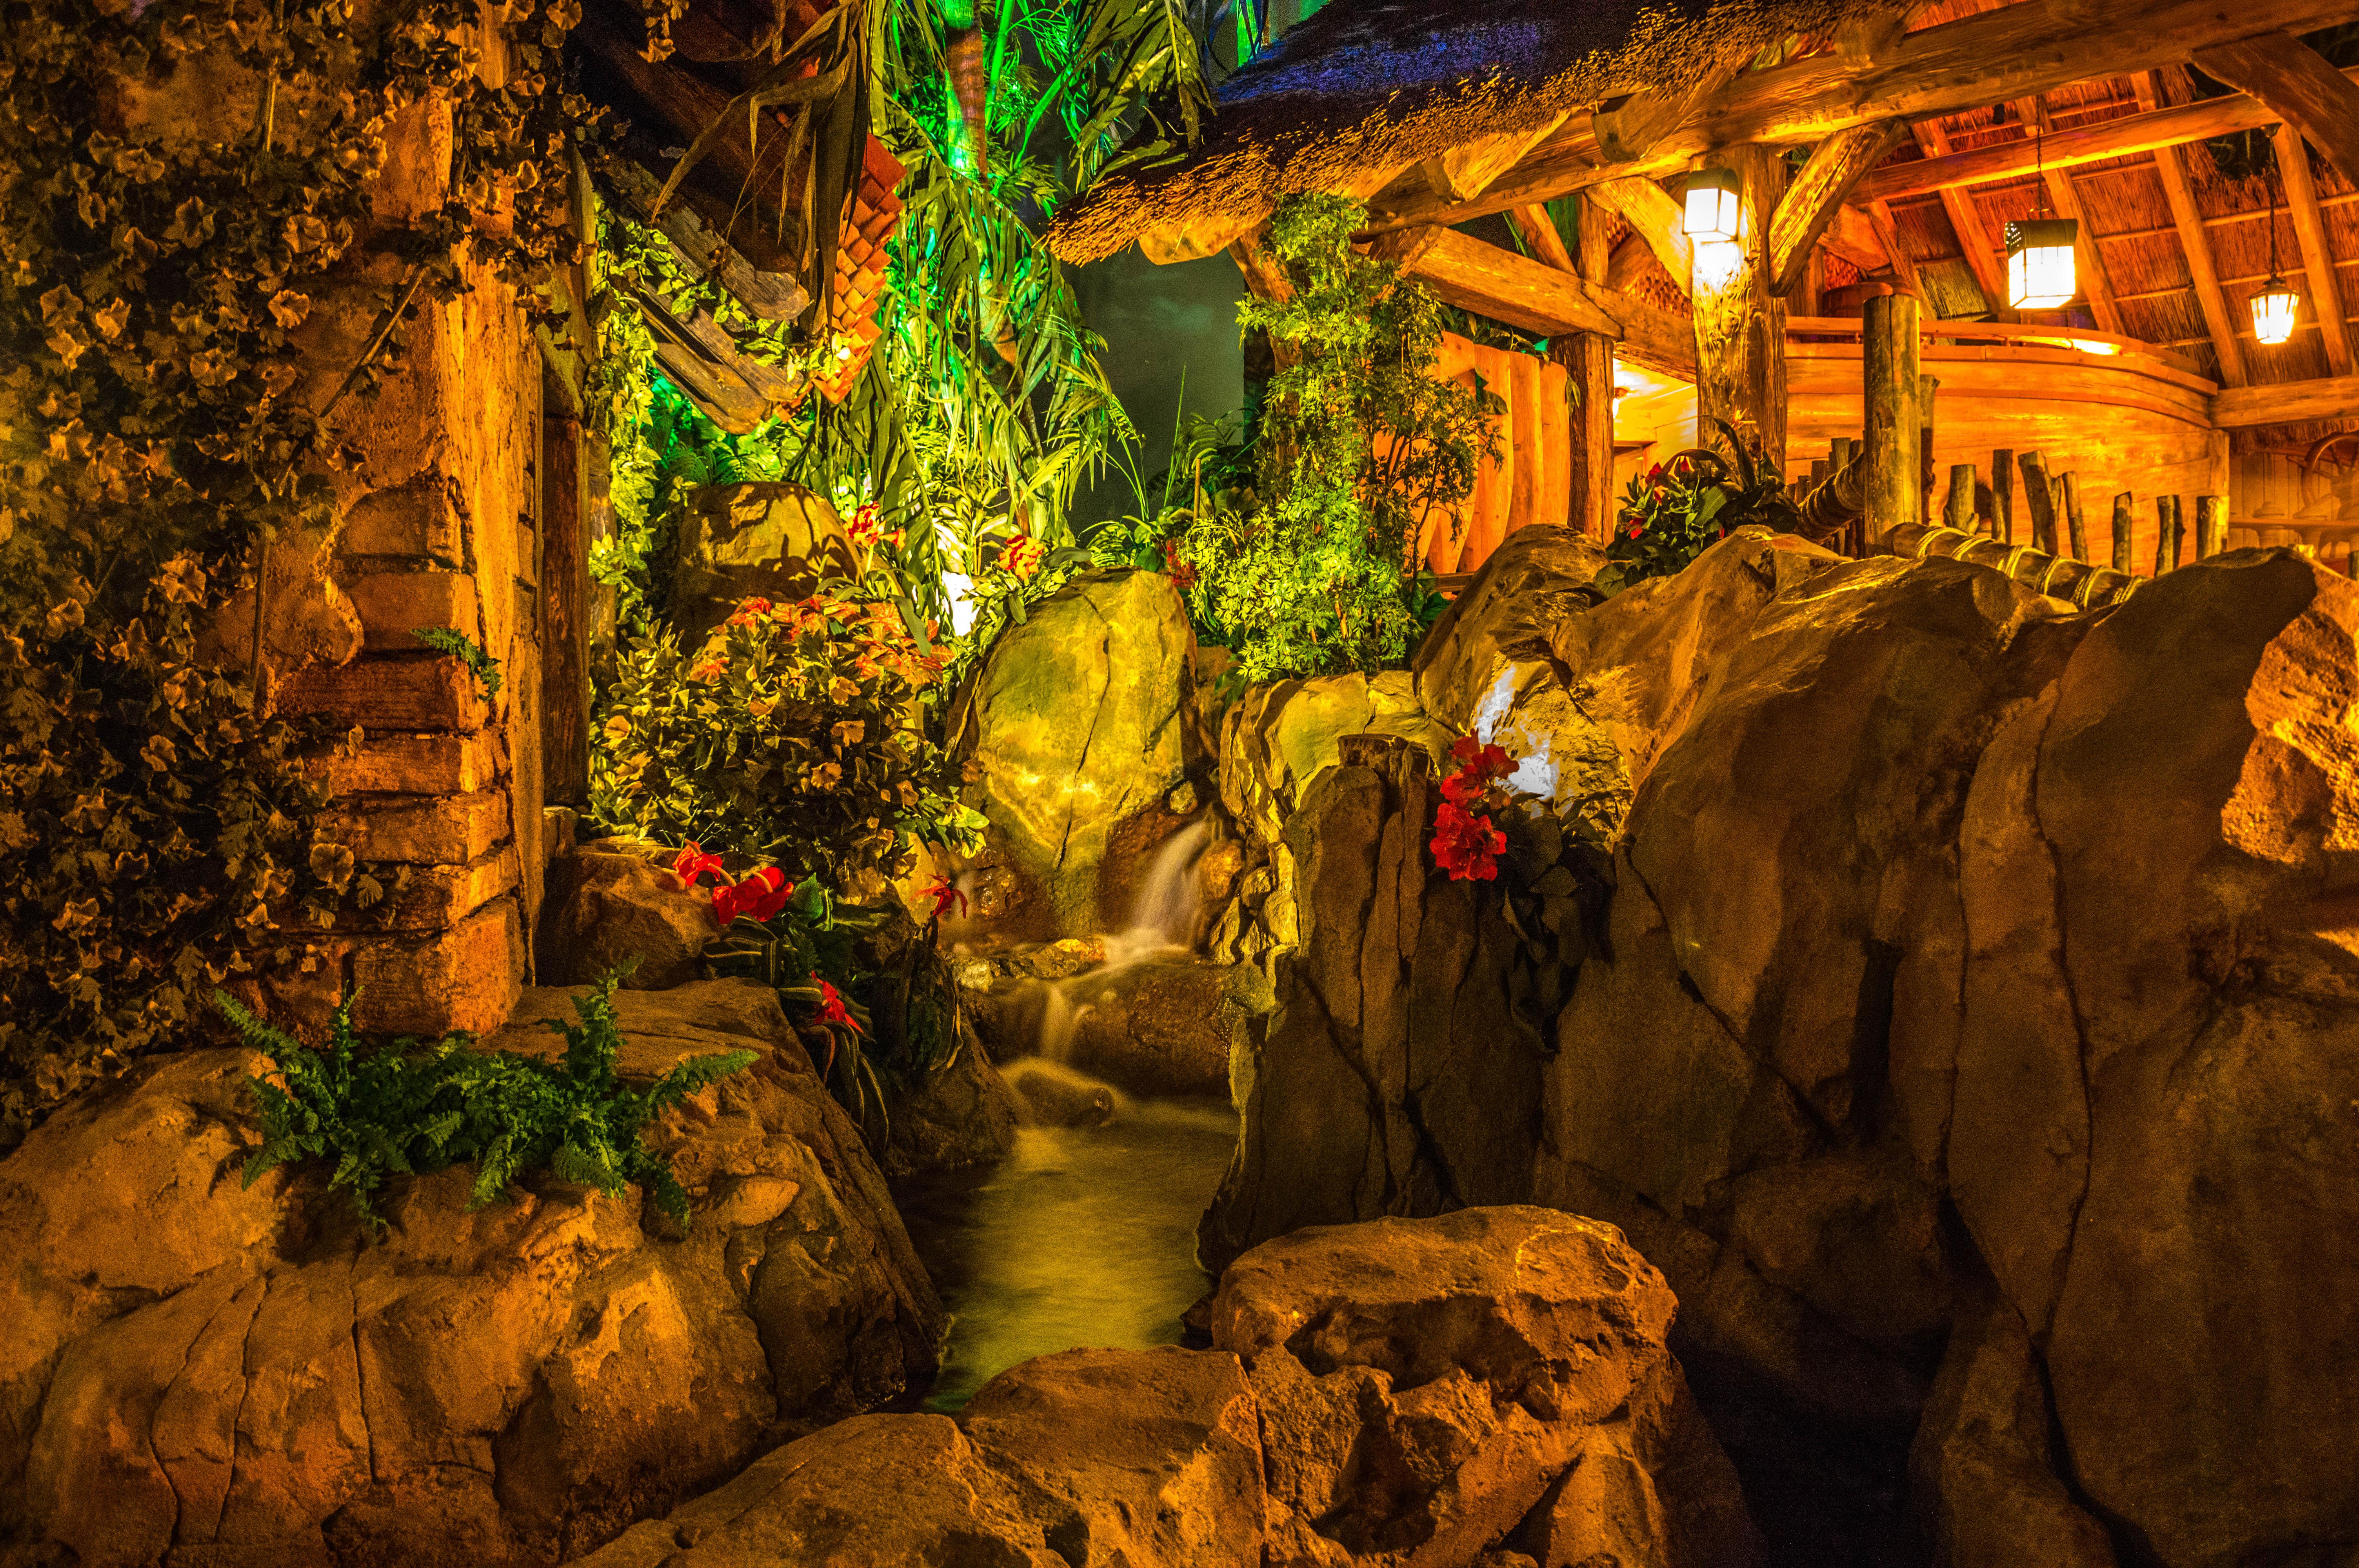 Photos de Disneyland Paris en HDR (High Dynamic Range) ! - Page 6 564260DSC0044